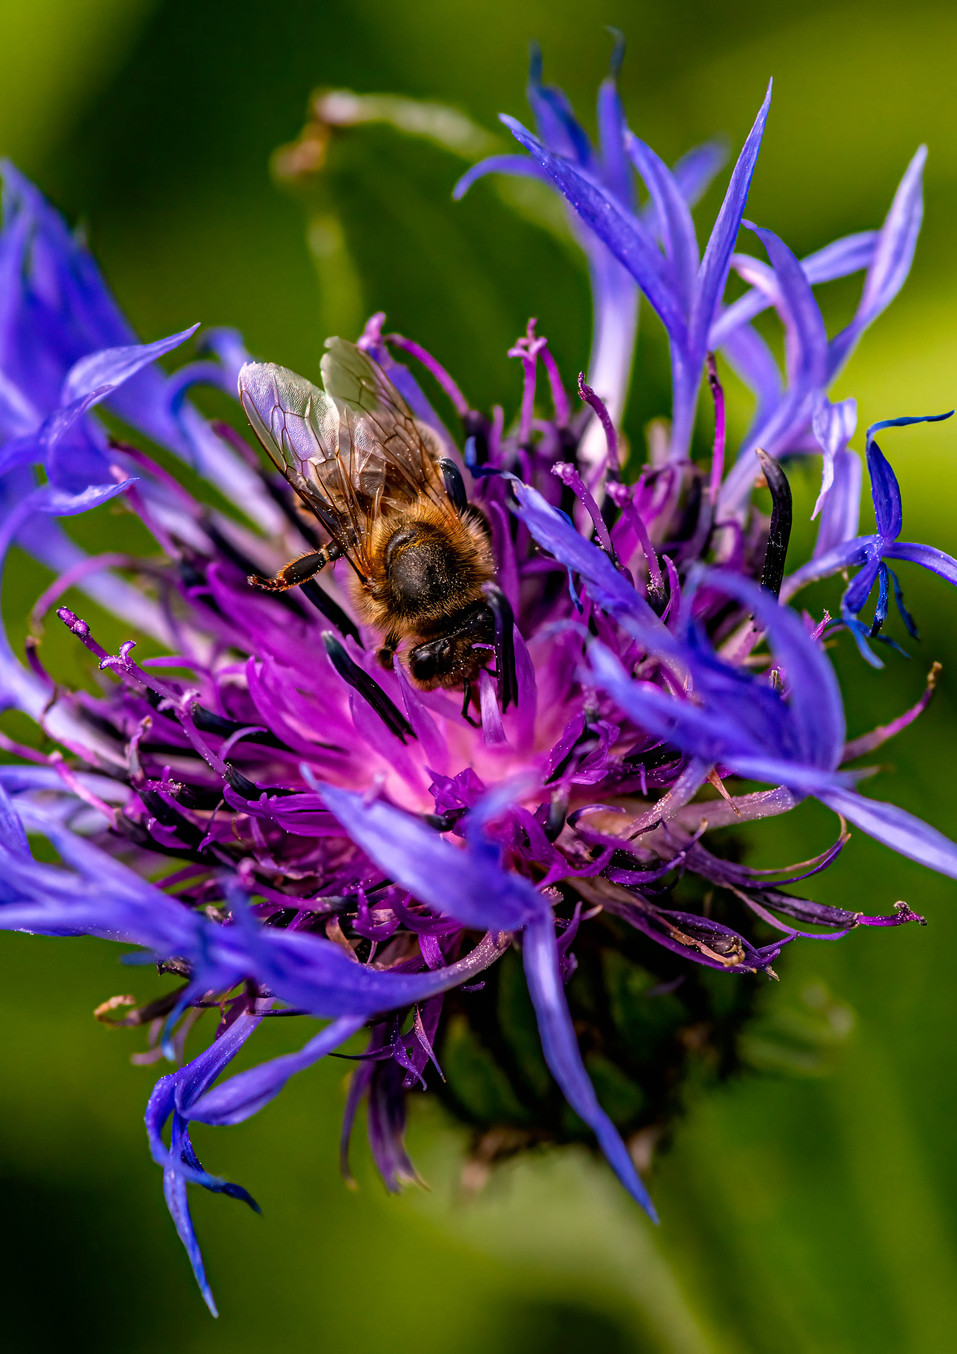 Ooh to bee Purple!!